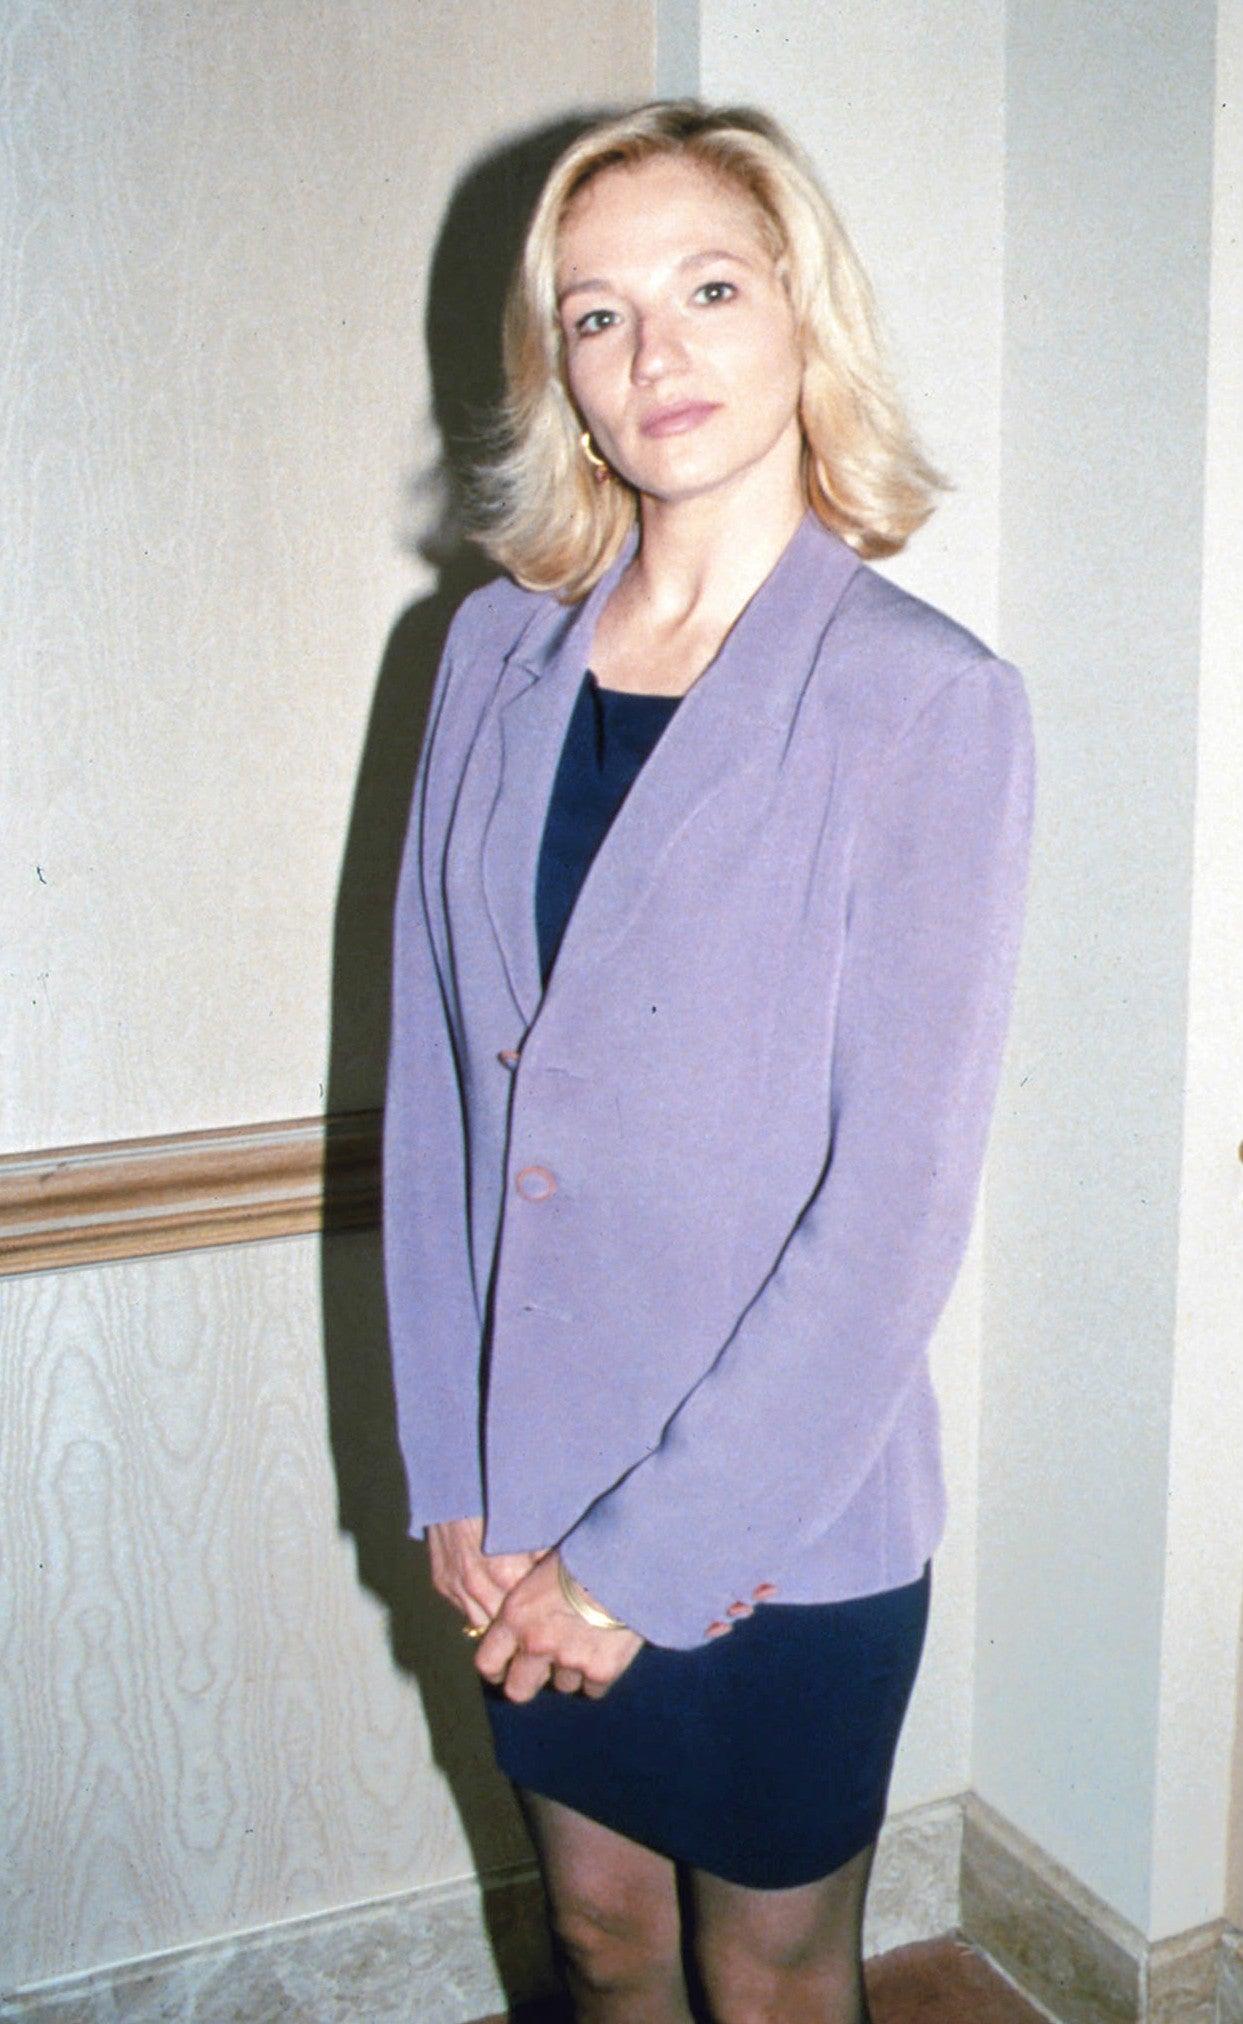 Lucie Trmikova